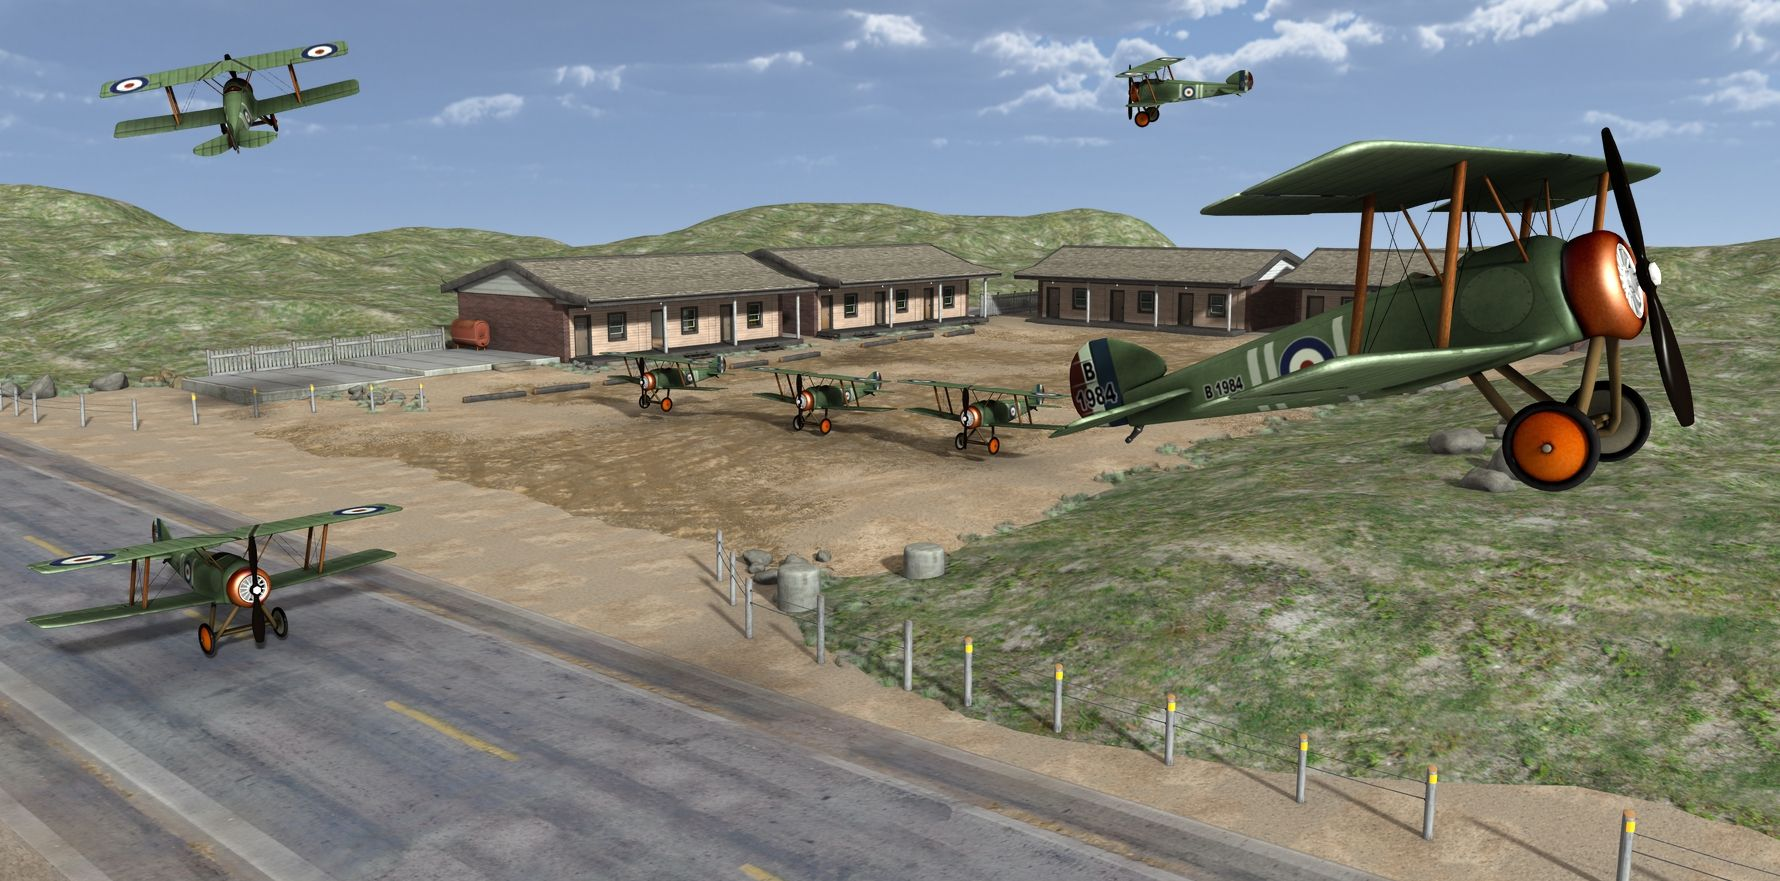 Biplane Airfield rendered in 3Delight in DAZ Studio 4.9